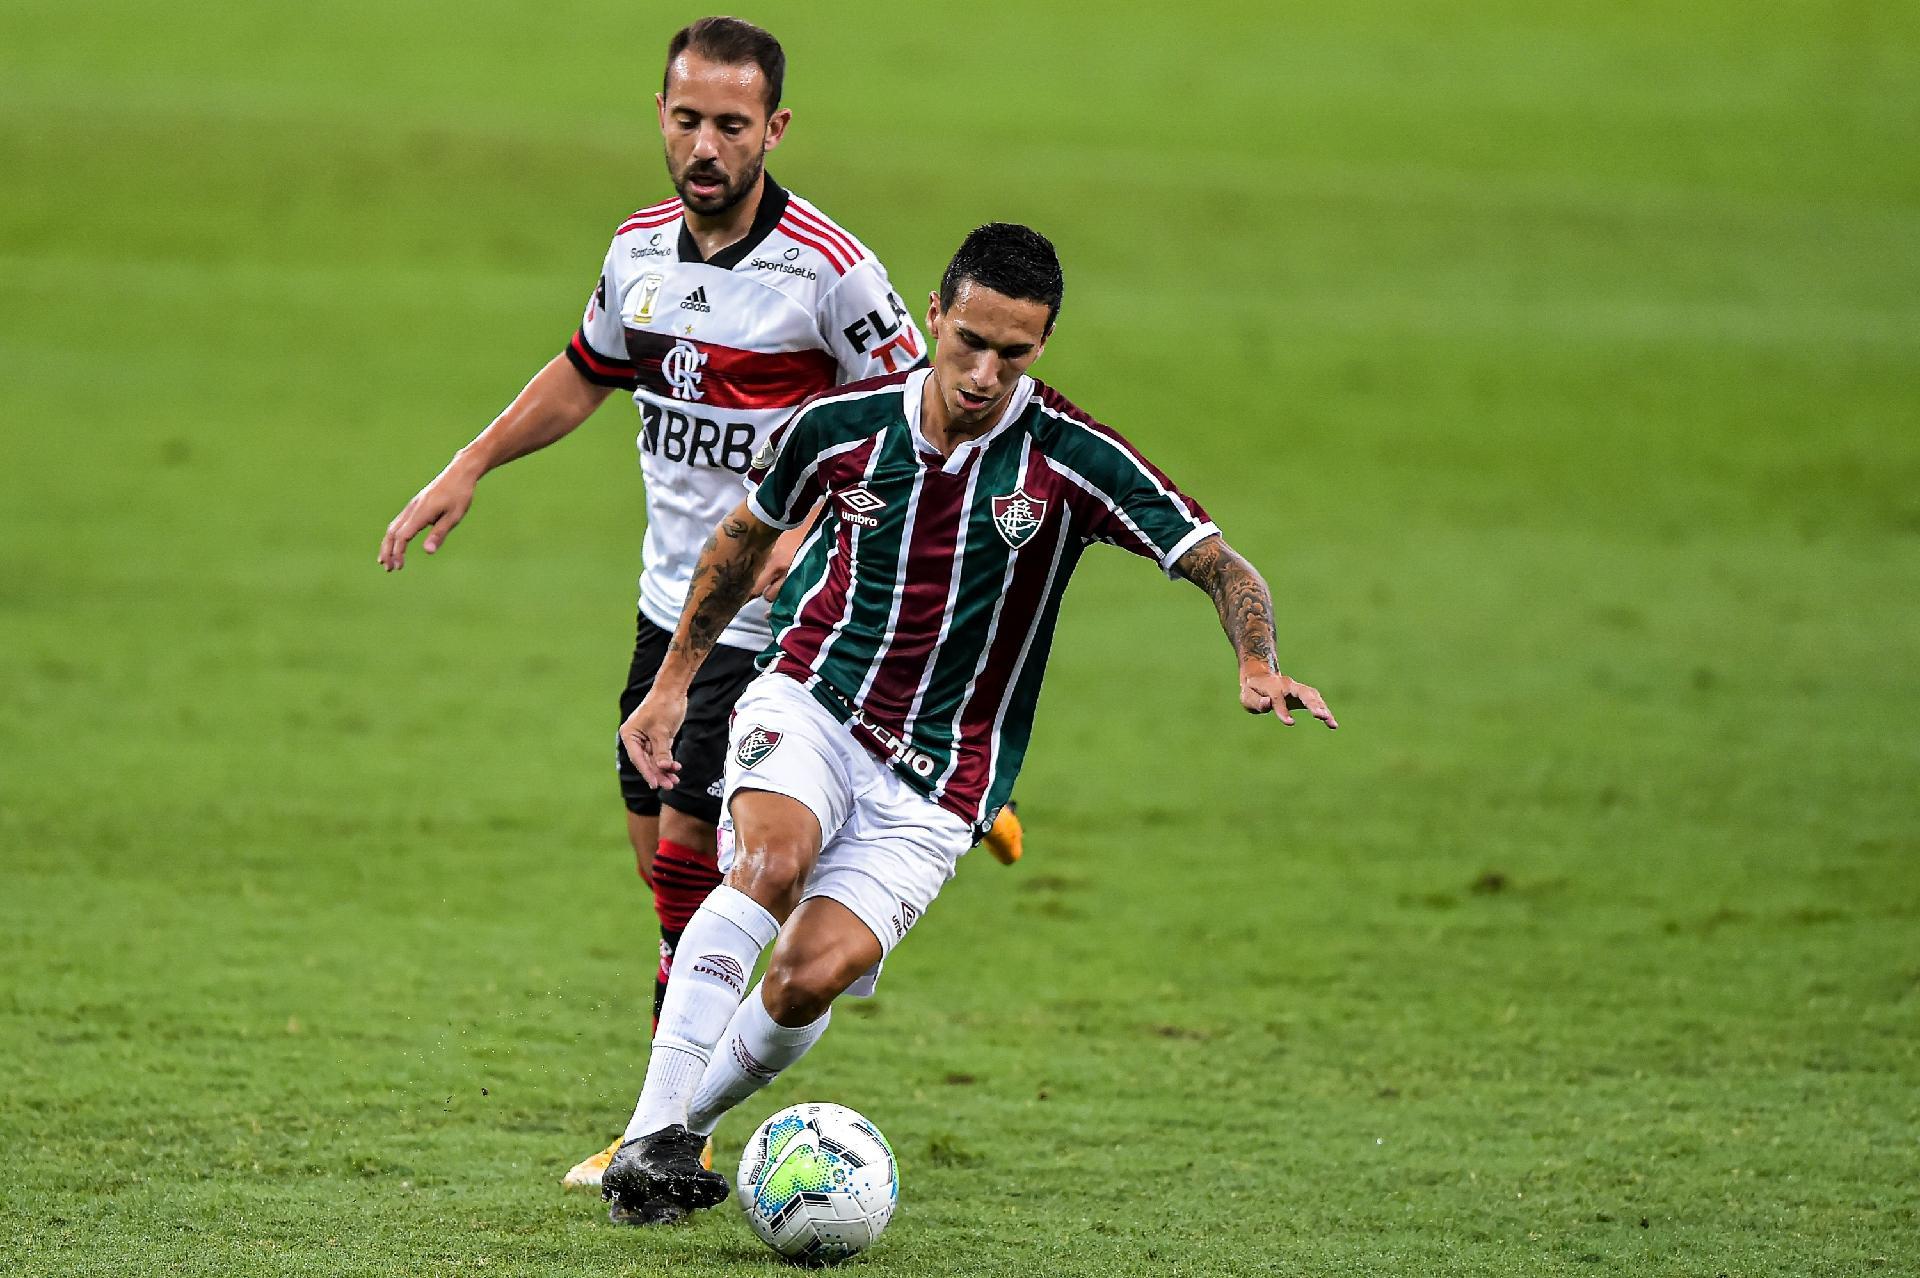 Éverton Ribeiro e Dodi disputam bola na partida entre Flamengo e Fluminense